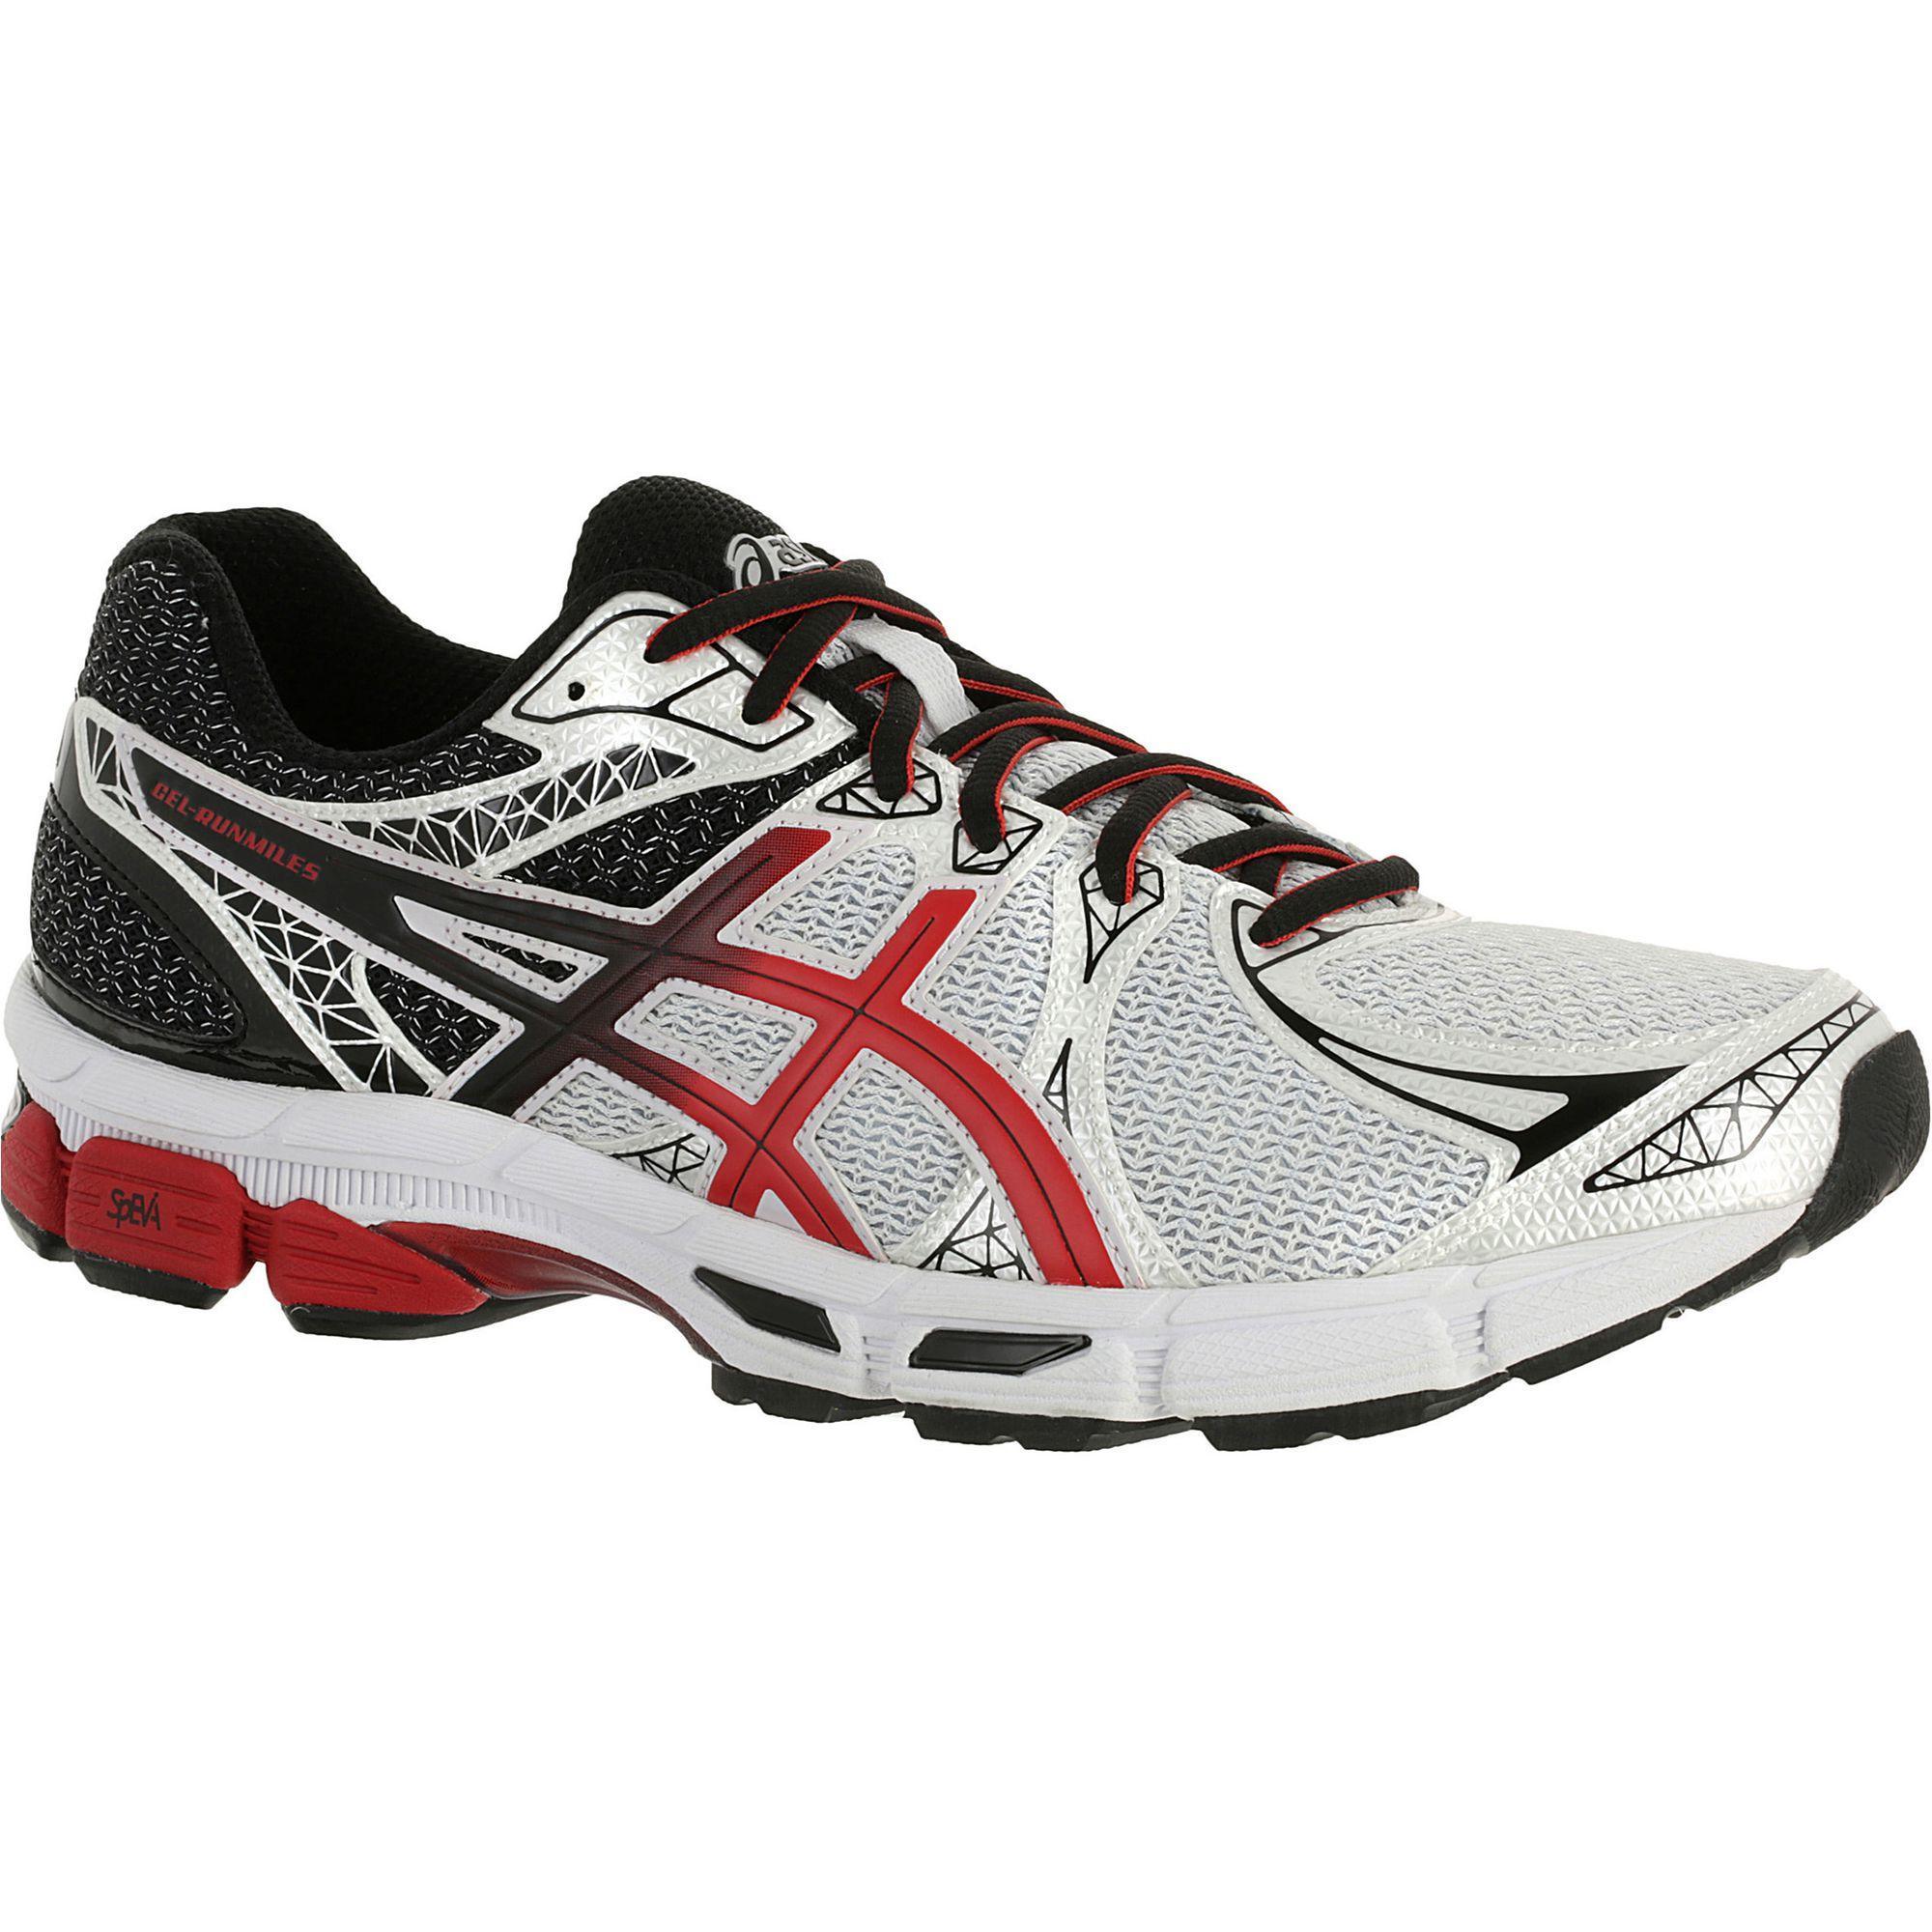 Men's road running shoes asics RUNMILES MEN GEL - Decathlon